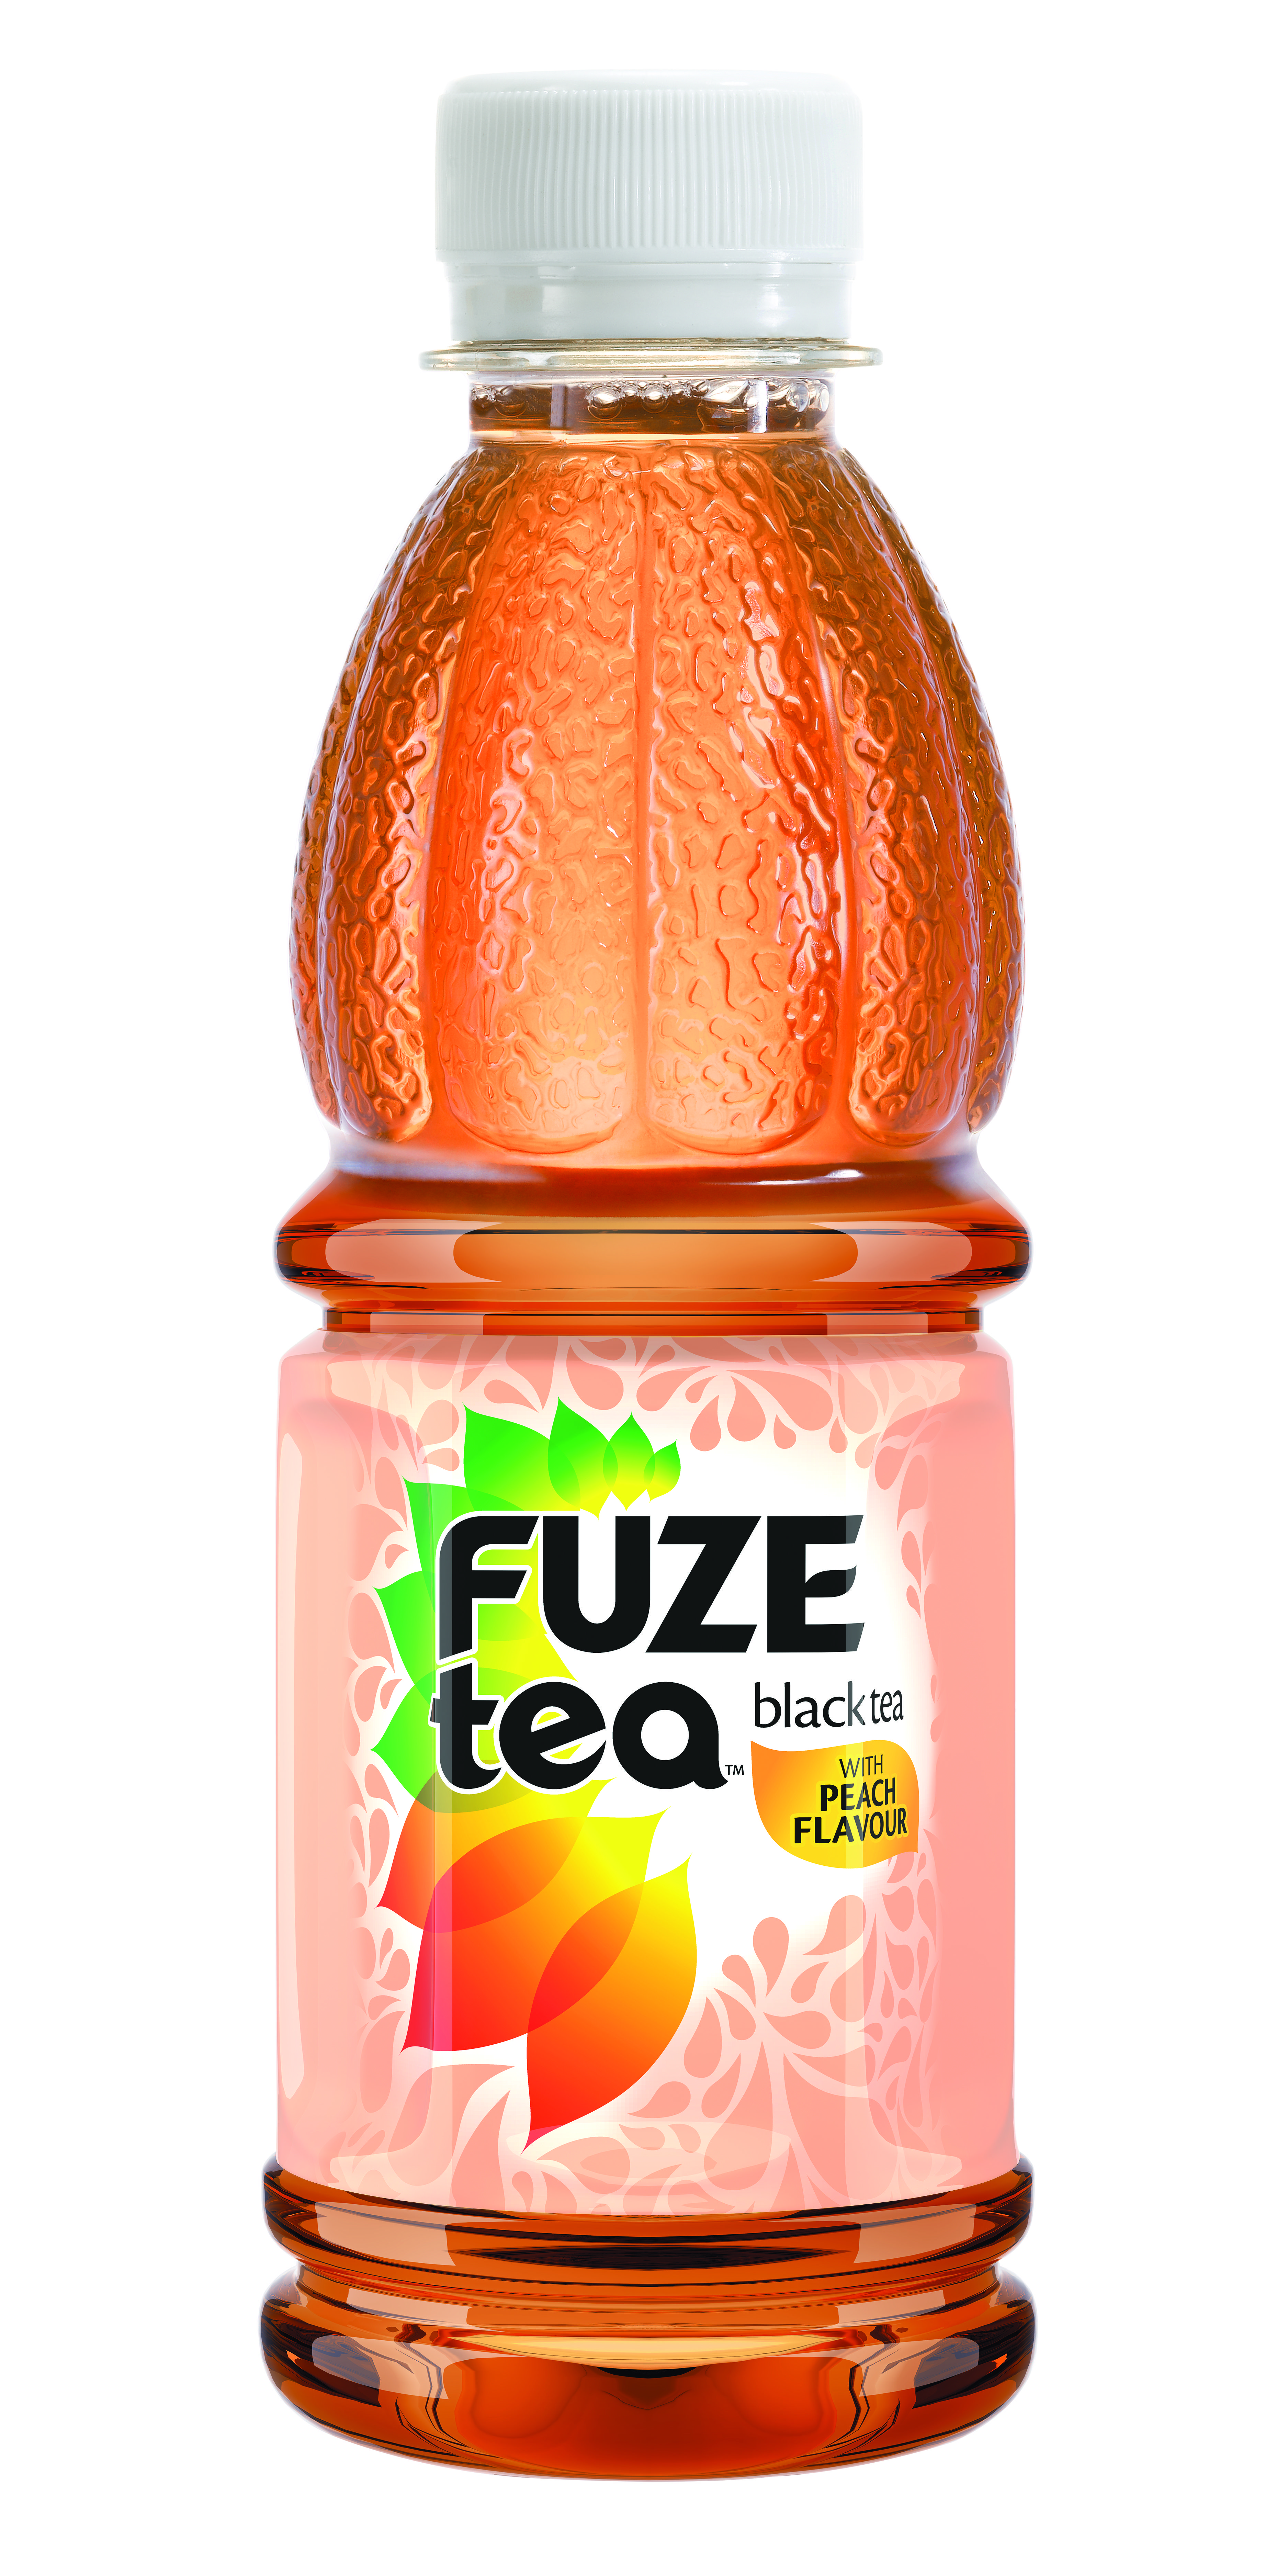 Fuze Tea Peach (With images) Peach drinks, Lemon drink